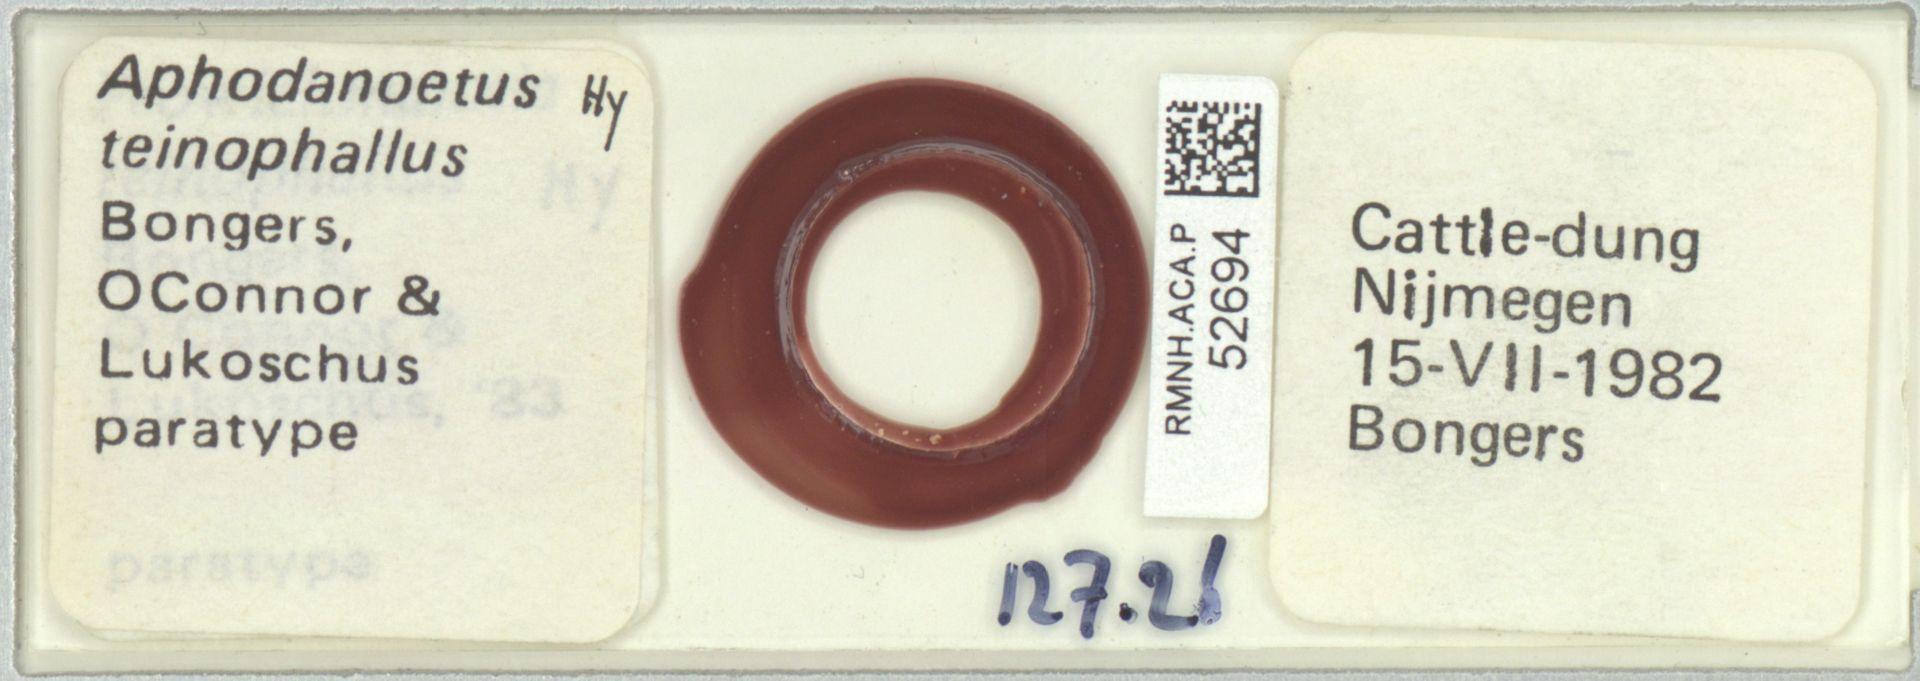 RMNH.ACA.P.52694   Aphodanoetus teinophallus Bongers, OConnor & Lukoschus